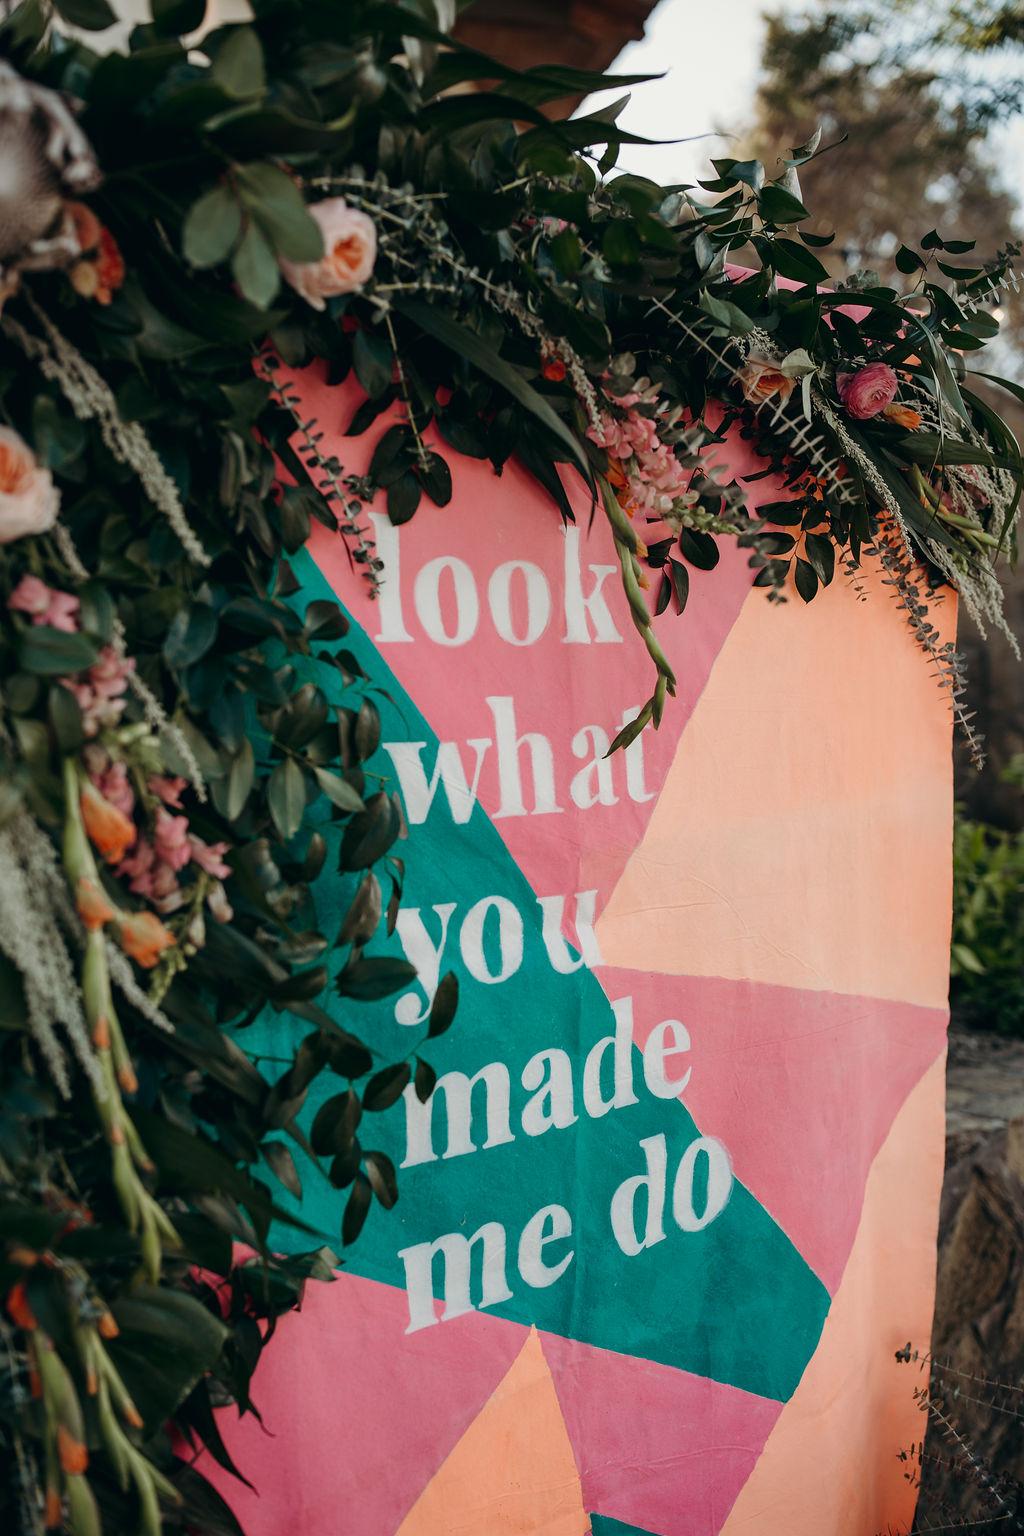 love-fern-design-studio-custom-wedding-invitations-for-the-modern-couple-modern-calligraphy-in-seattle-washington-custom-wedding-stationery-neon-acrylic-eclectic-alice-wonderland-wedding-taylor-swift